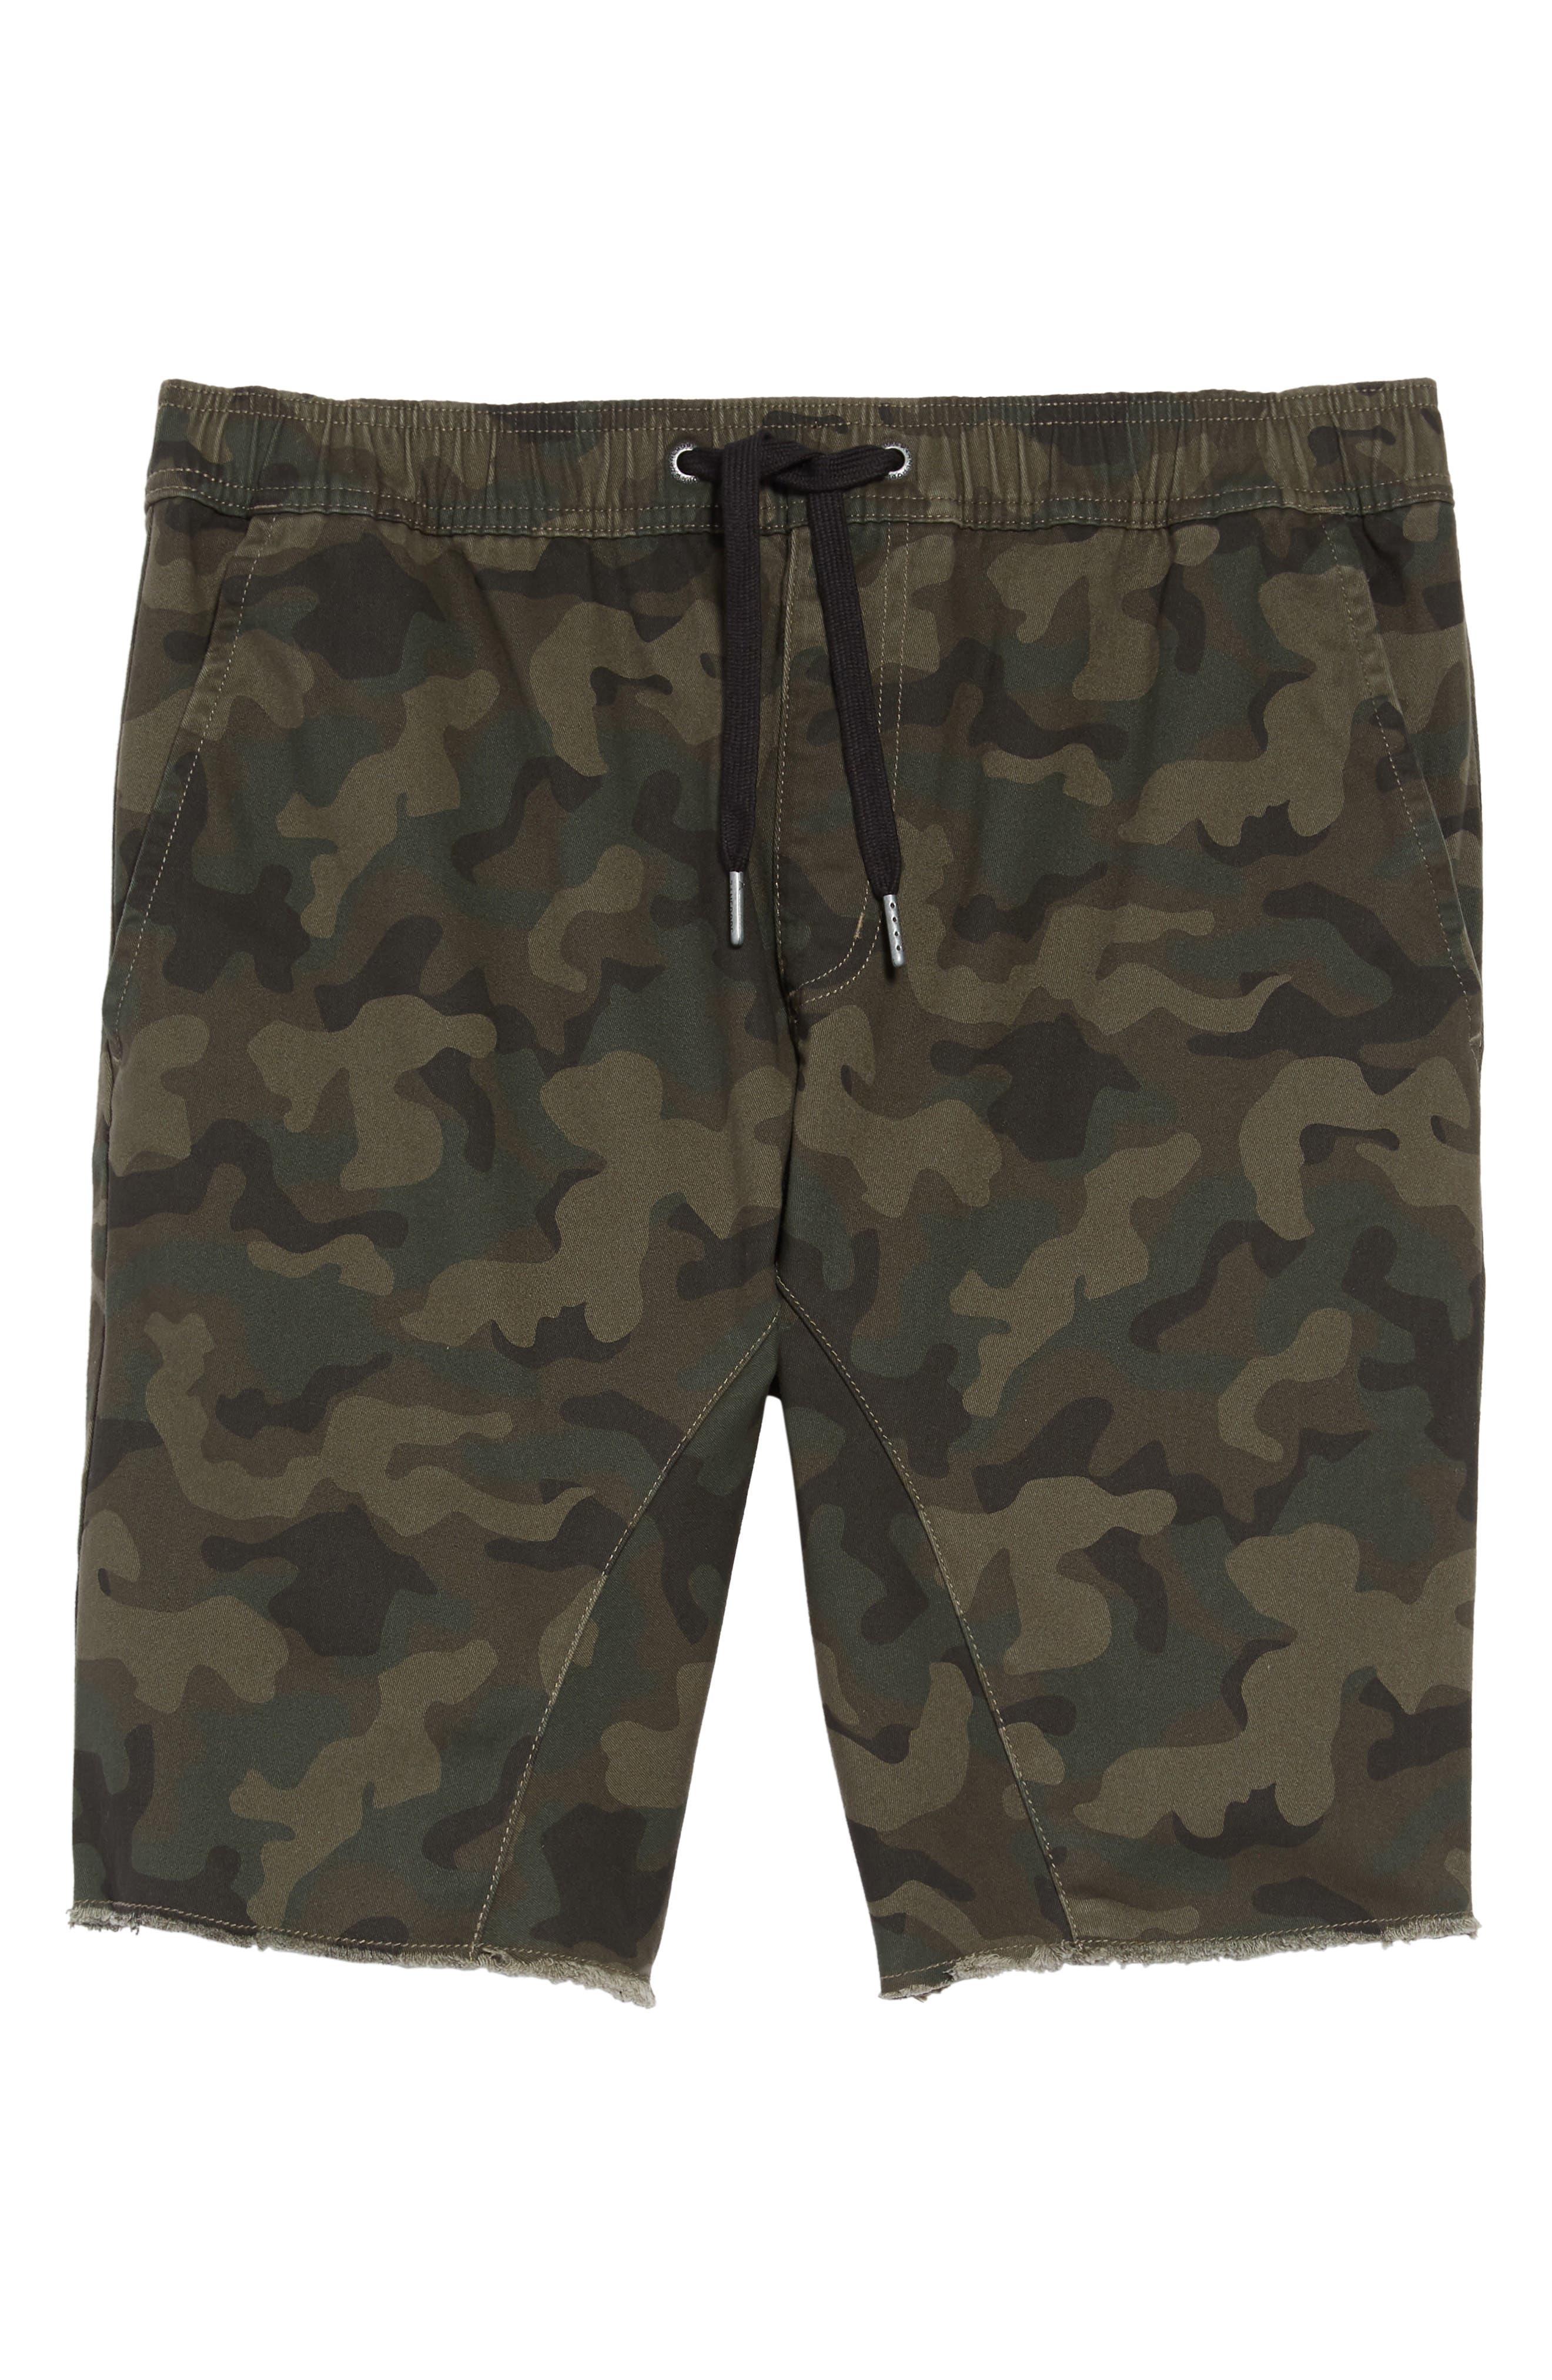 Sureshot Camo Print Shorts,                         Main,                         color, CAMO